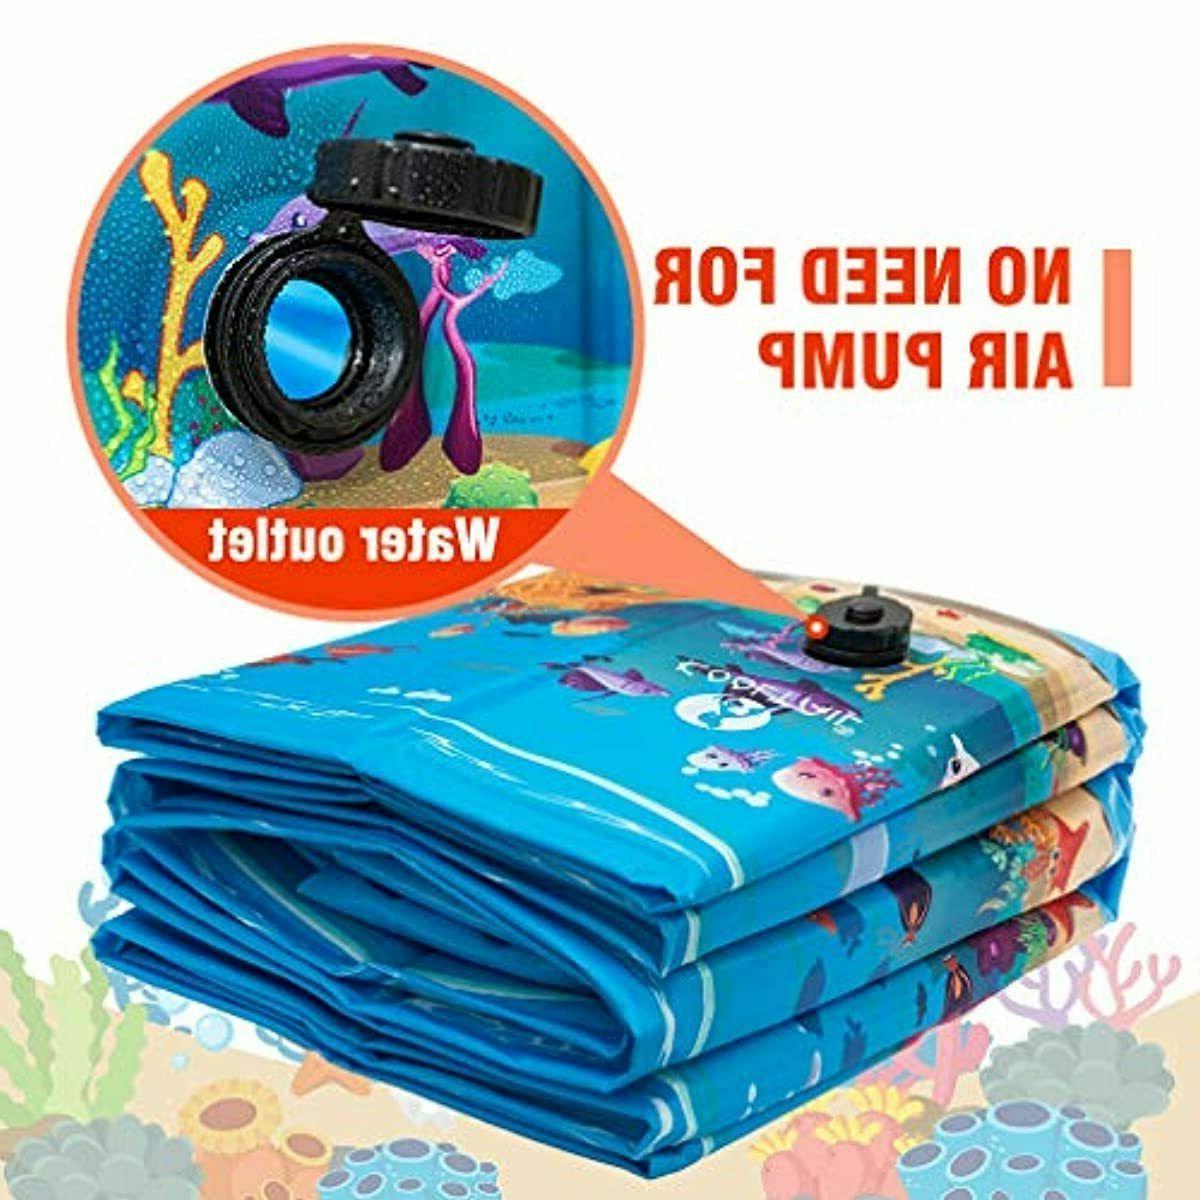 KOOLTAIL Foldable Swimming Pool Extra Large Pet Summ